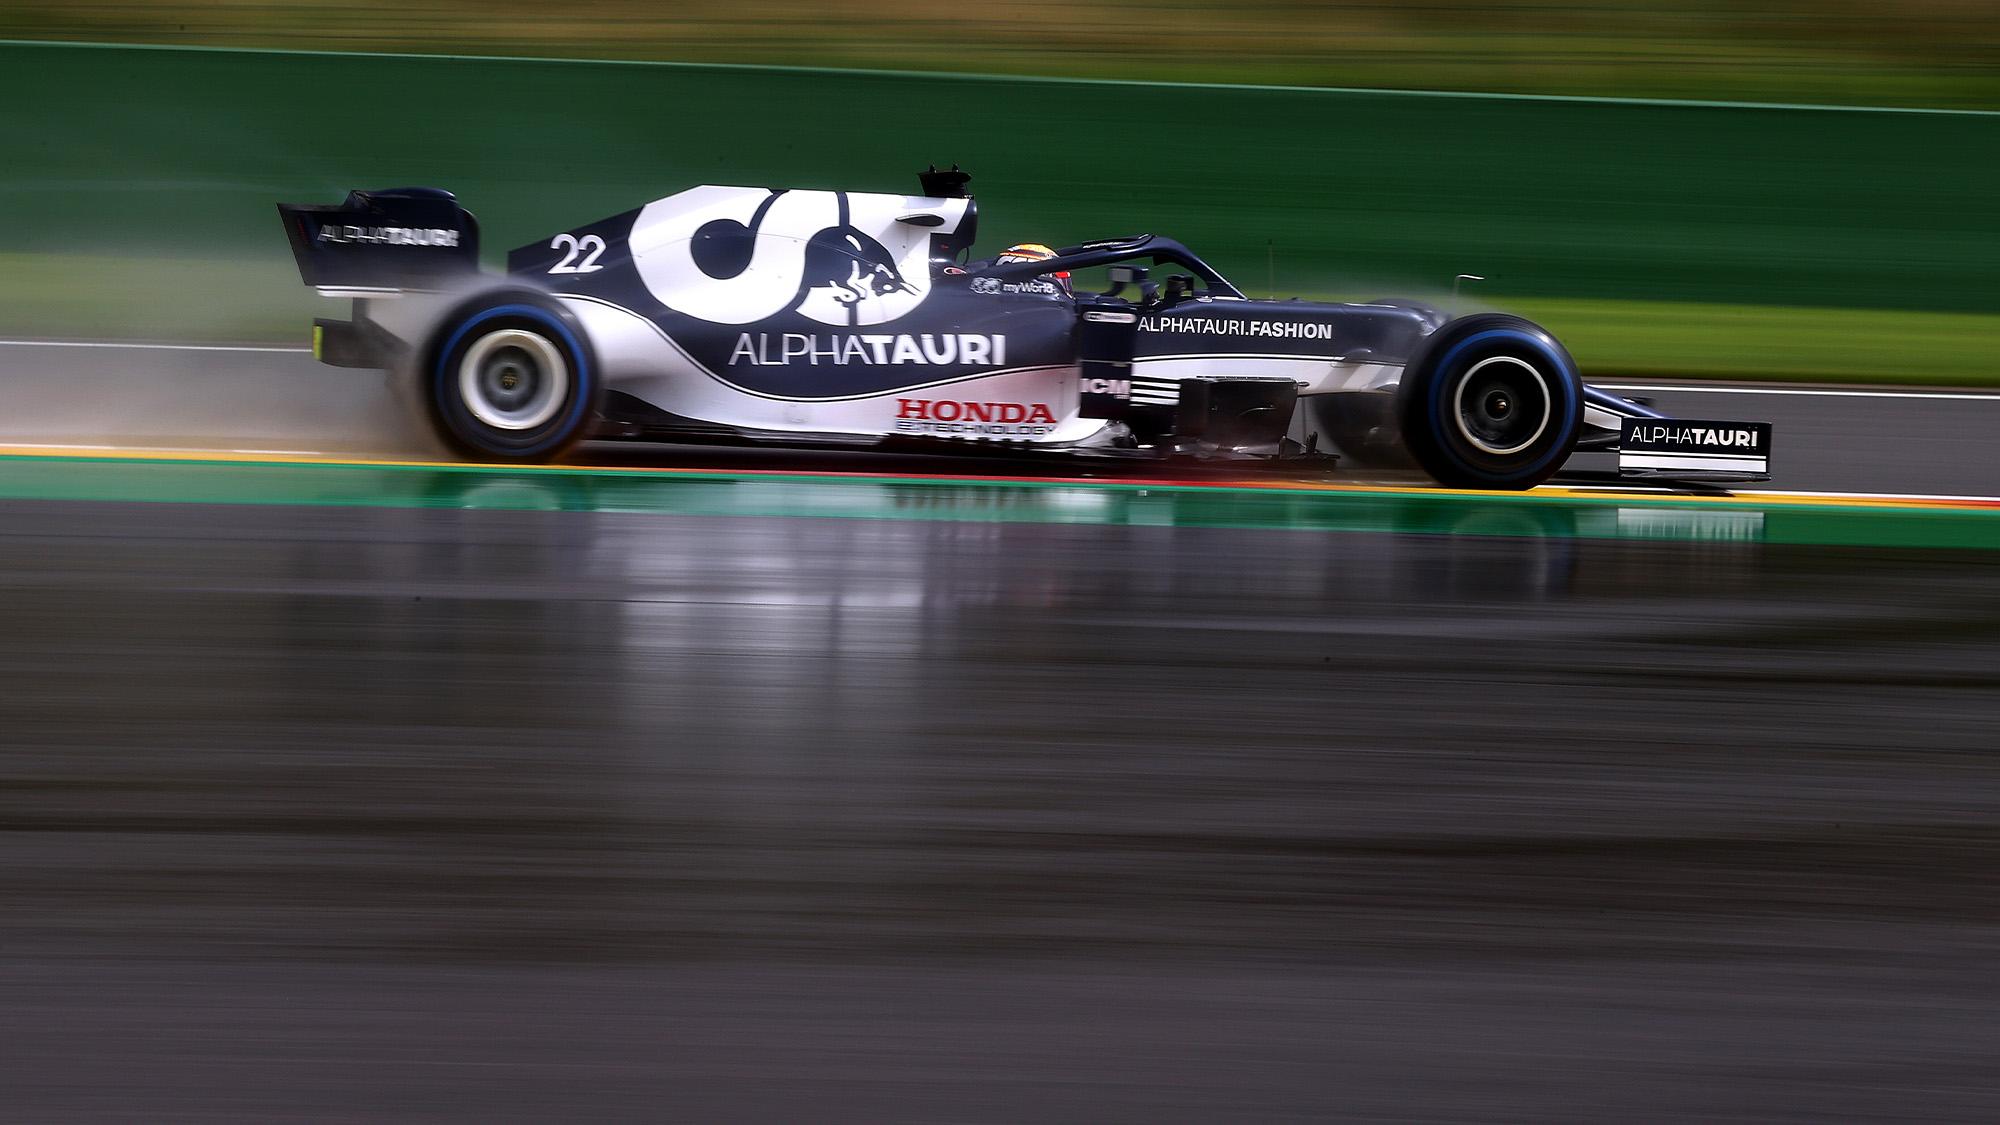 Yuki Tsunoda qualifying for the 2021 Belgian Grand Prix